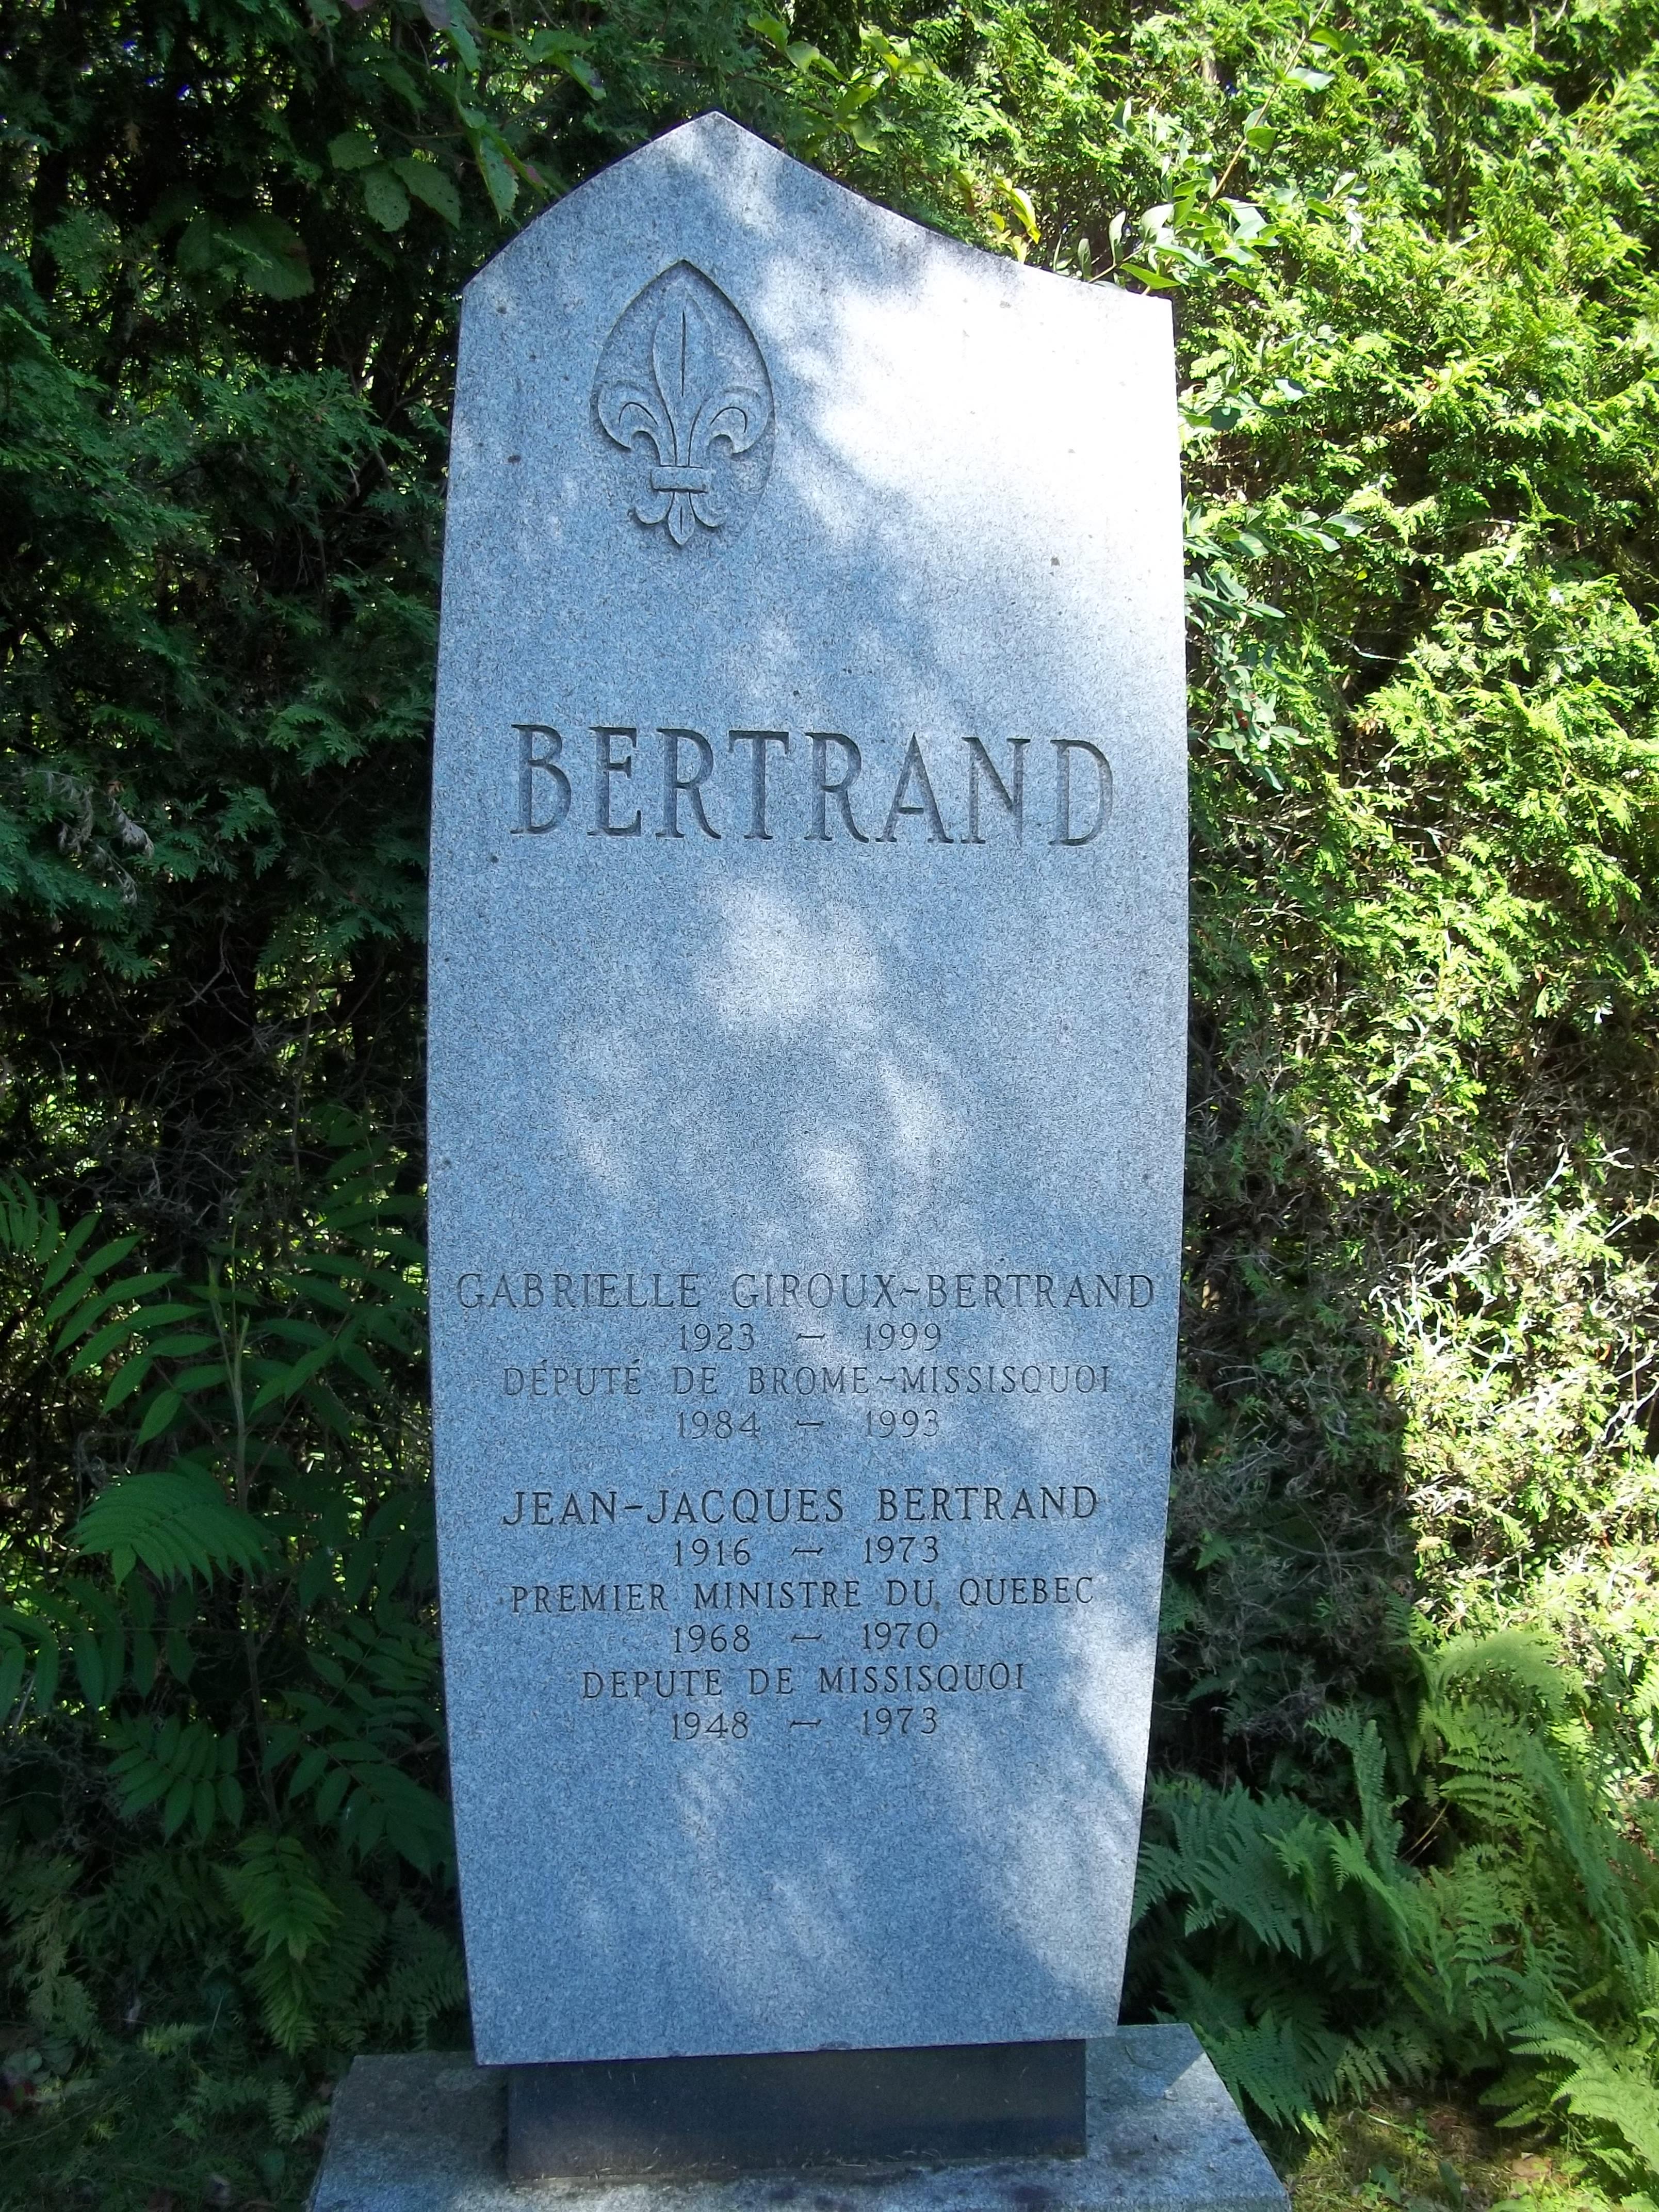 Jean-Jacques Bertrand